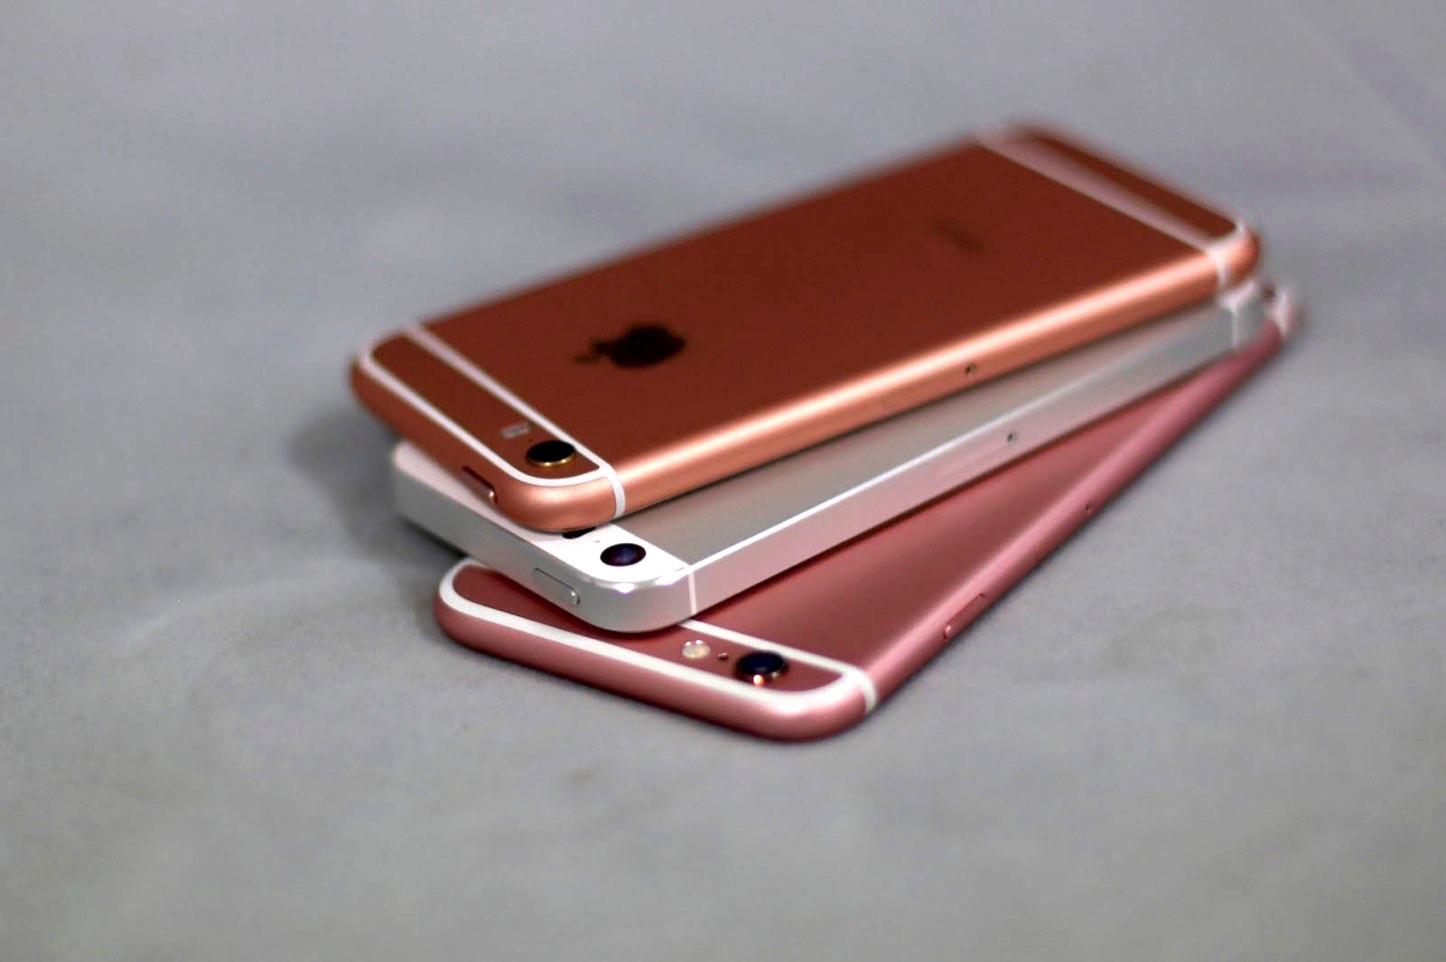 iPhone-SE-Fake-Samples-from-China-07.jpg